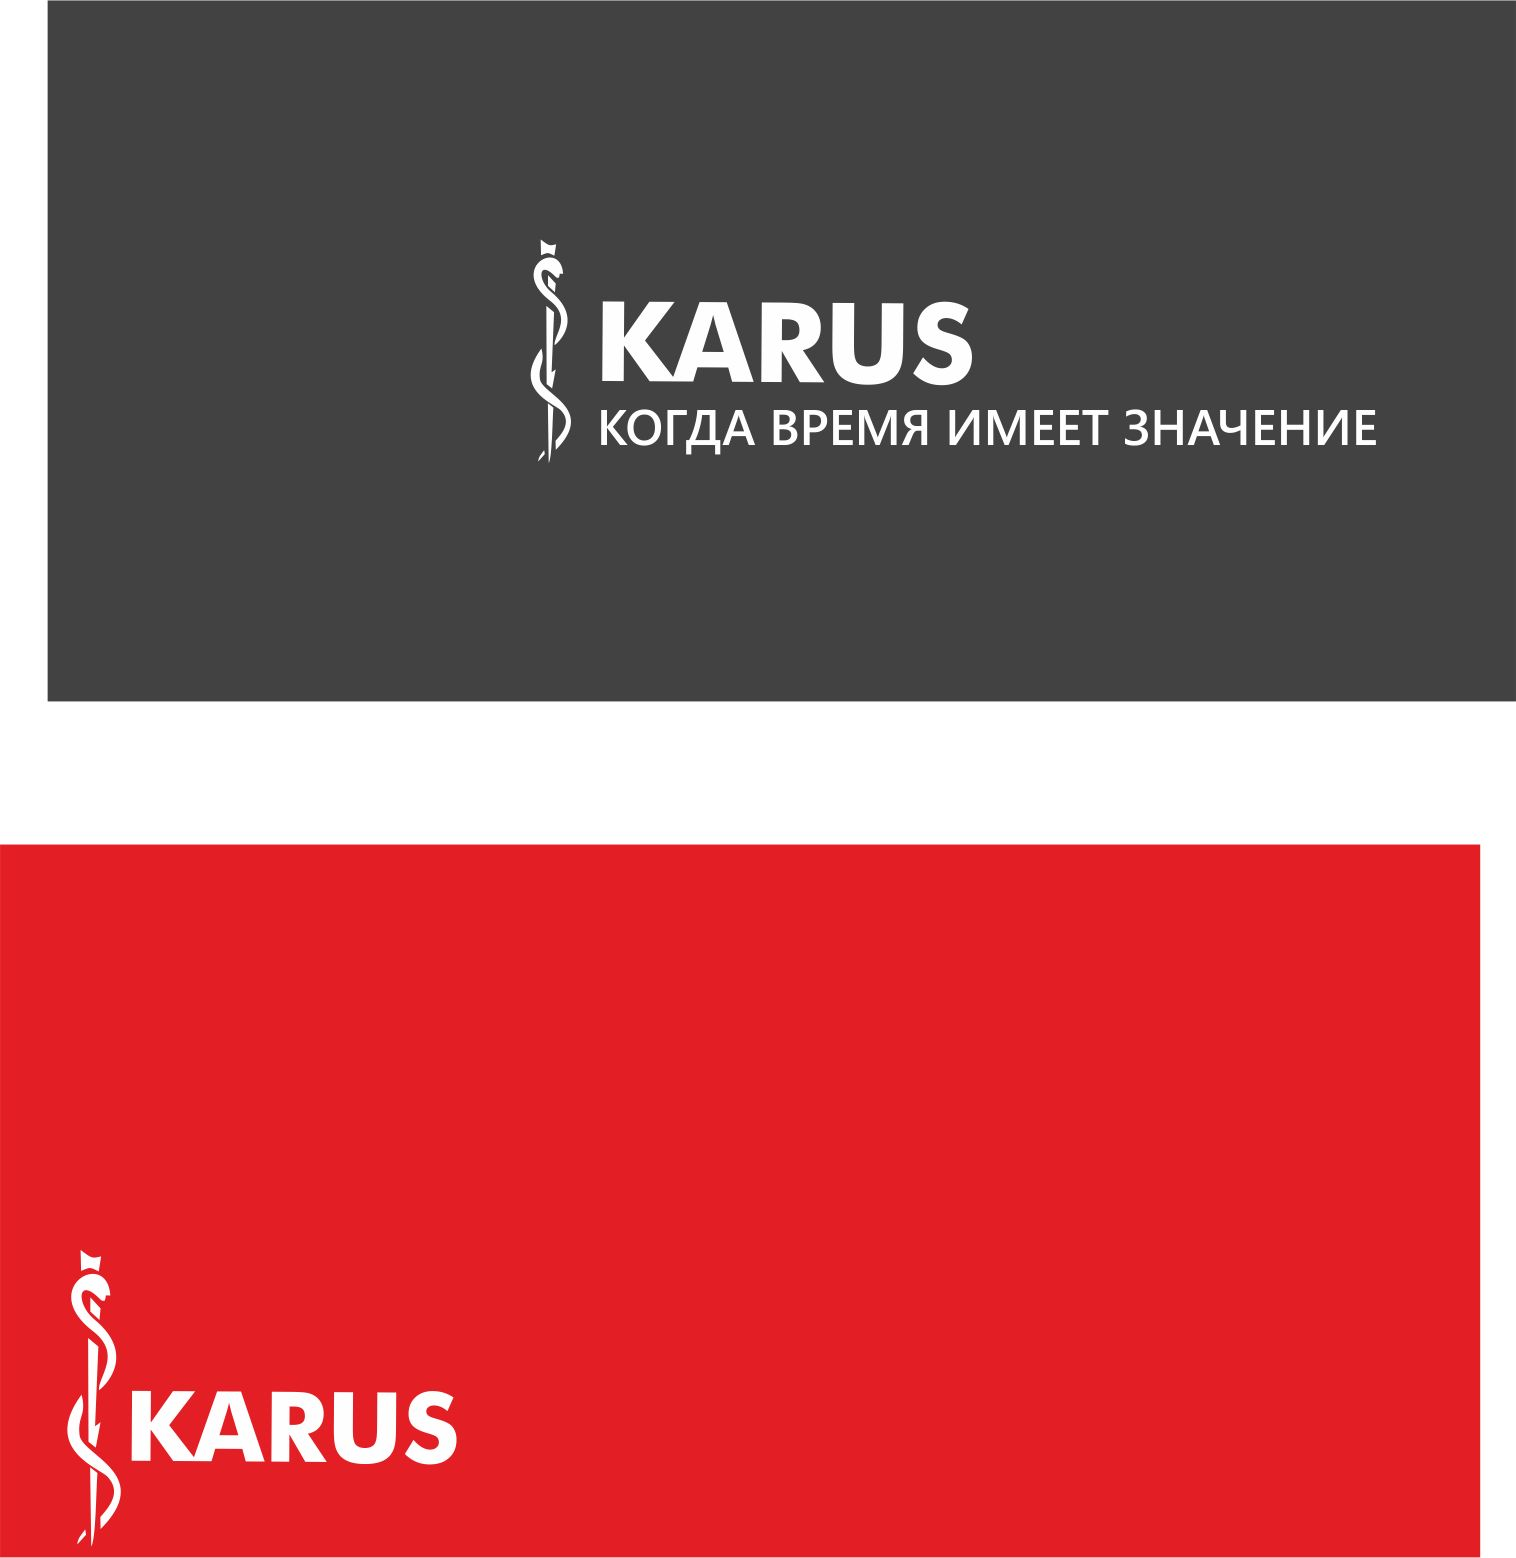 Разработка логотипа, фирменных цветов и фирменного знака фото f_2785353fe5063469.jpg